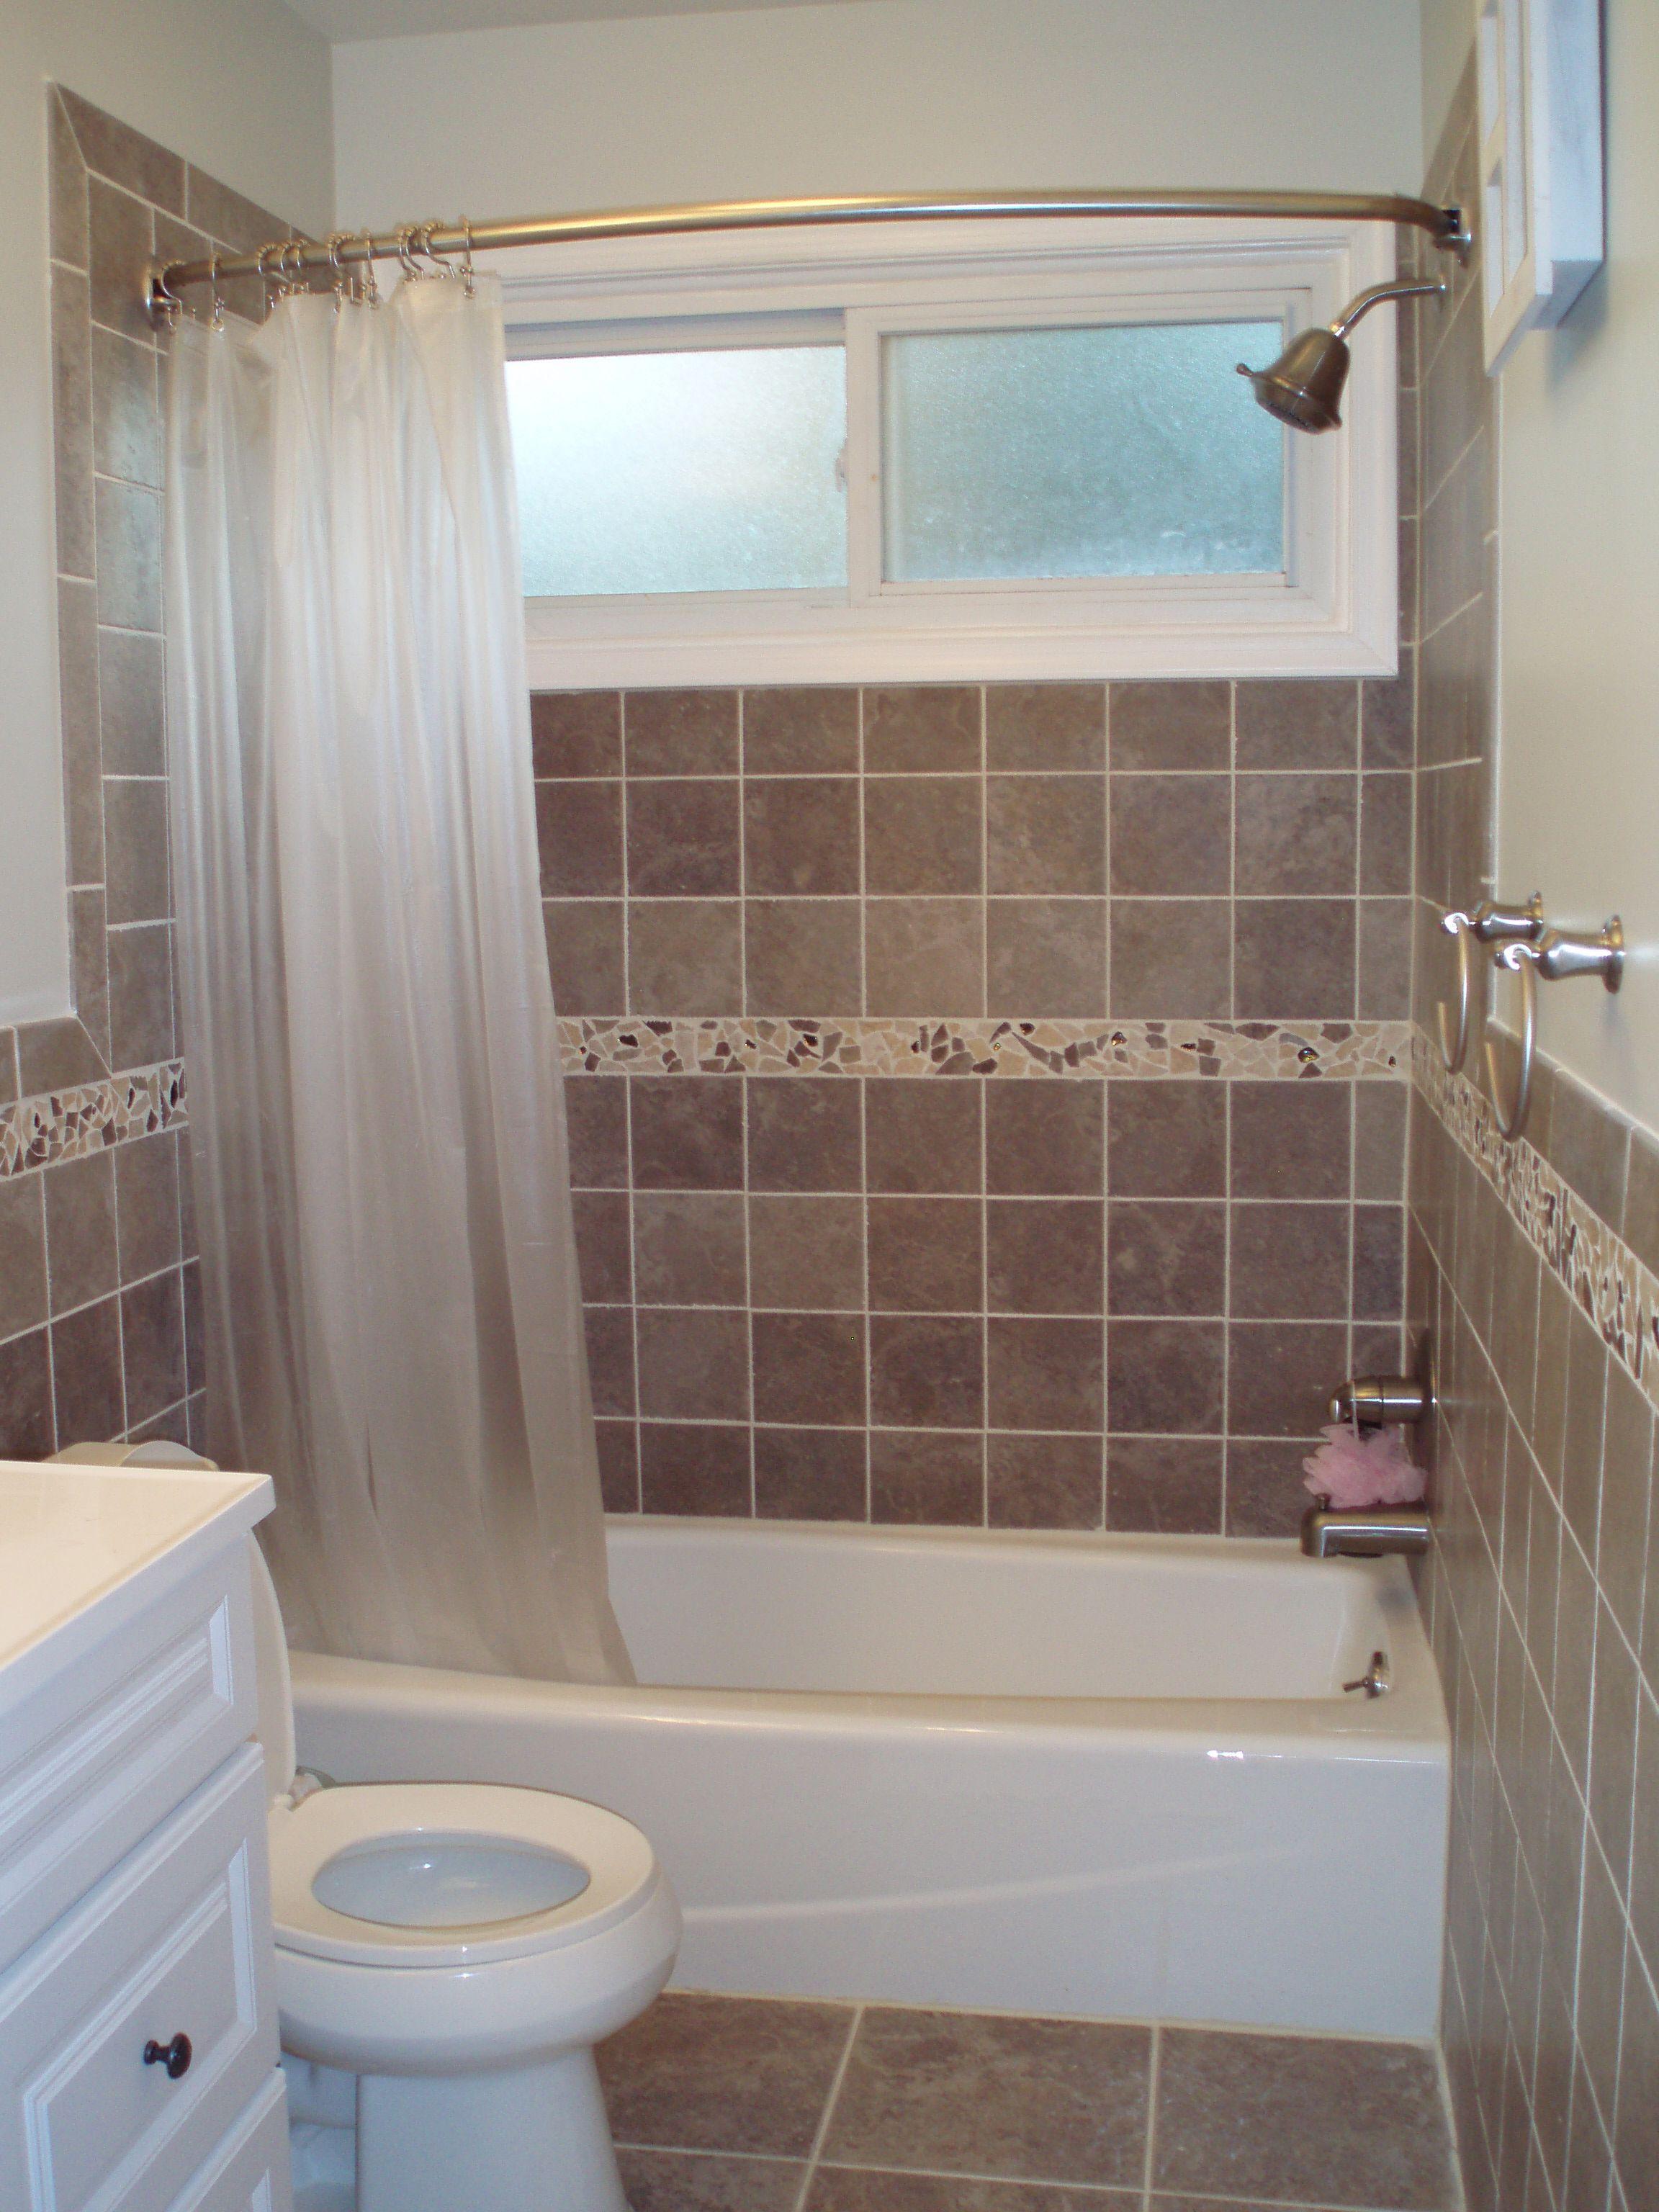 budget bathrooms decor on the wonderful small decorating bathroom a best designs ideas gallery of romantic modern